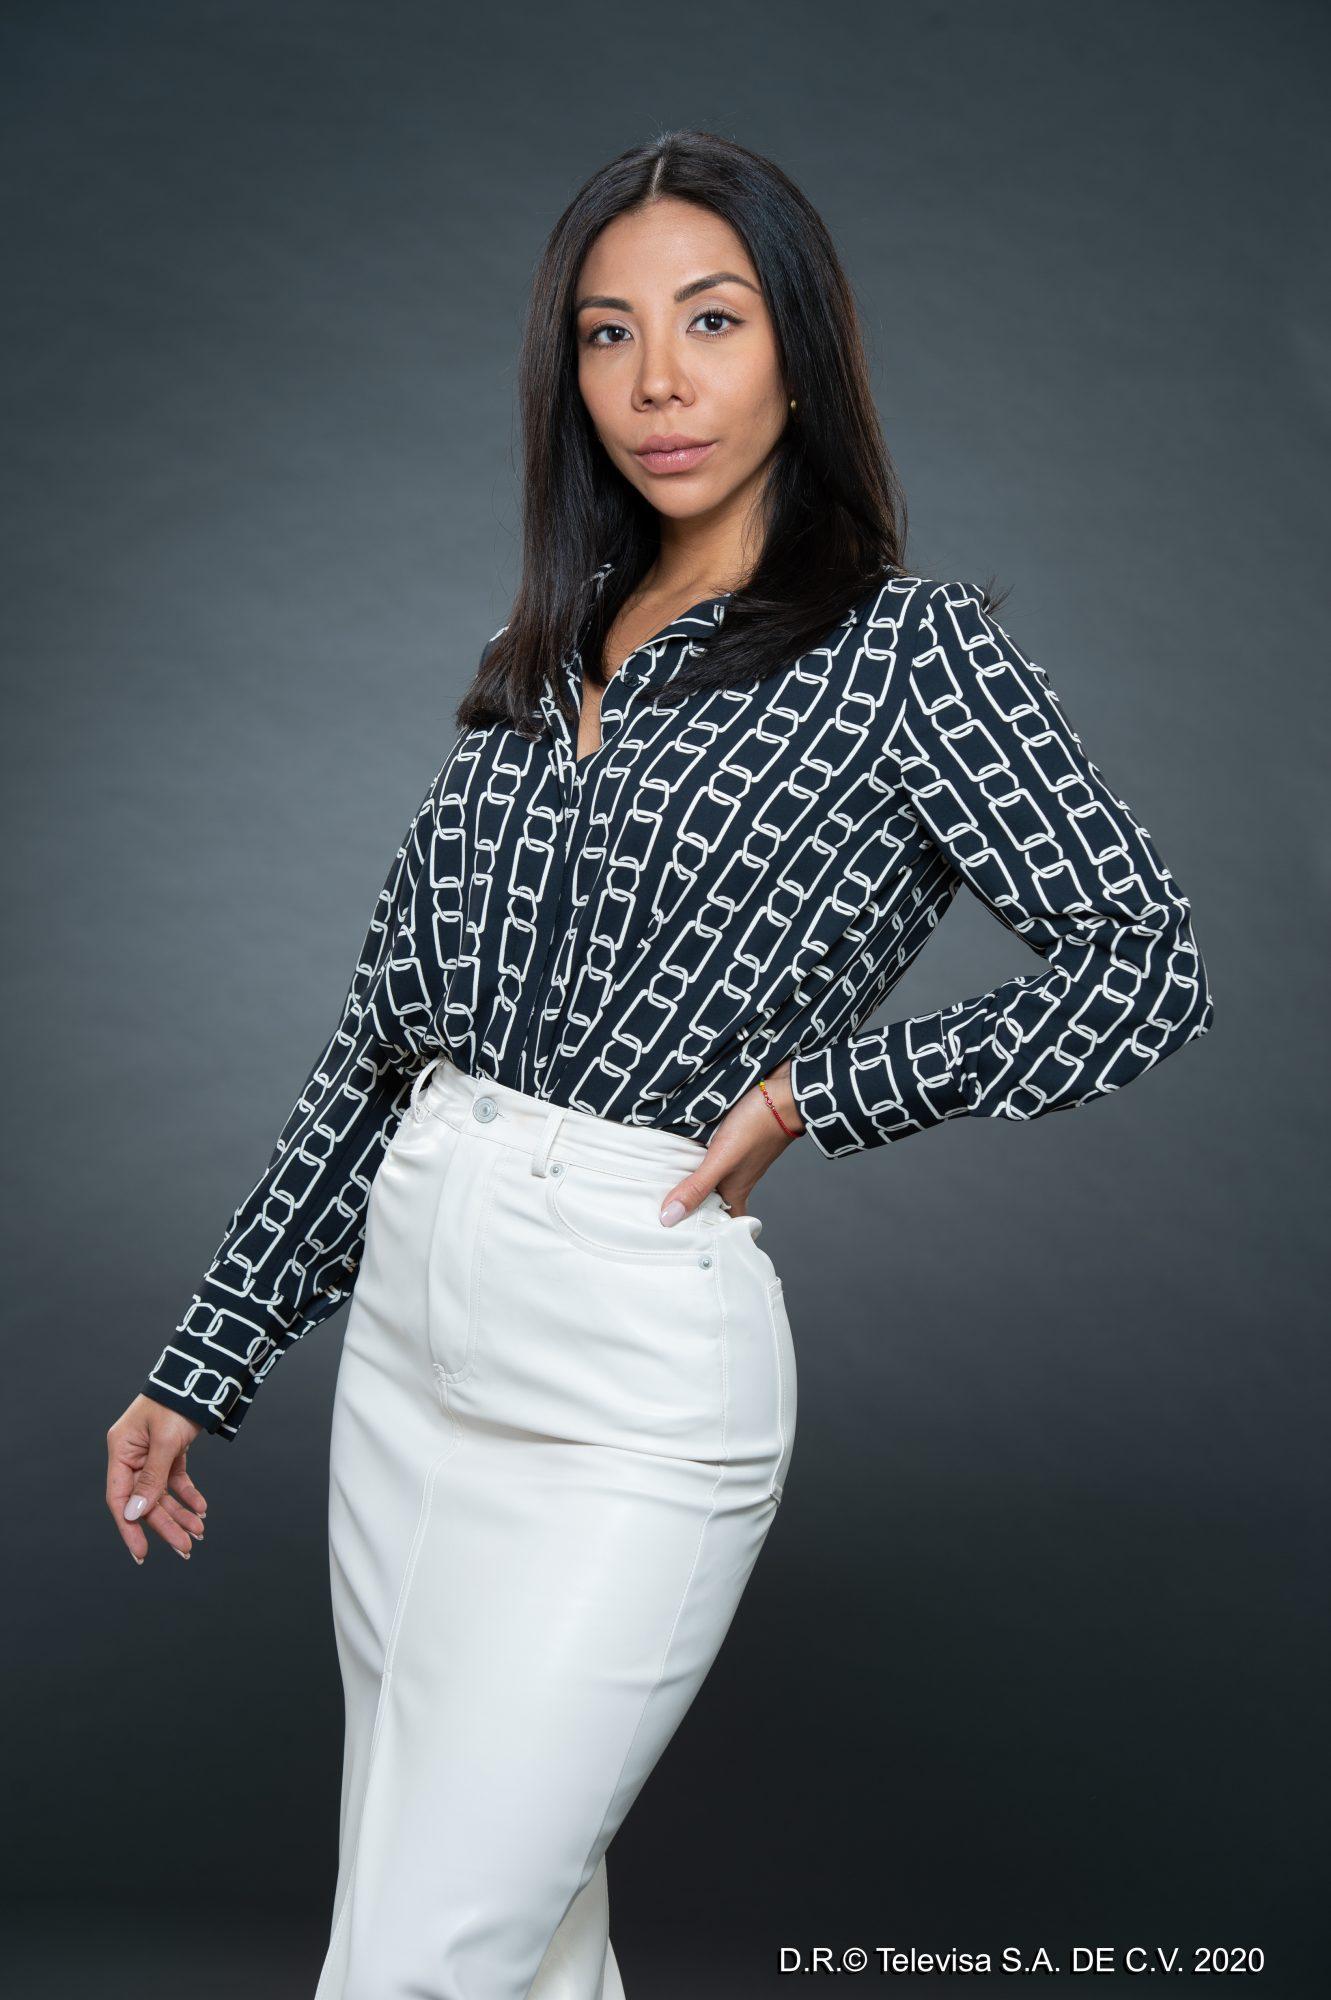 Michelle González